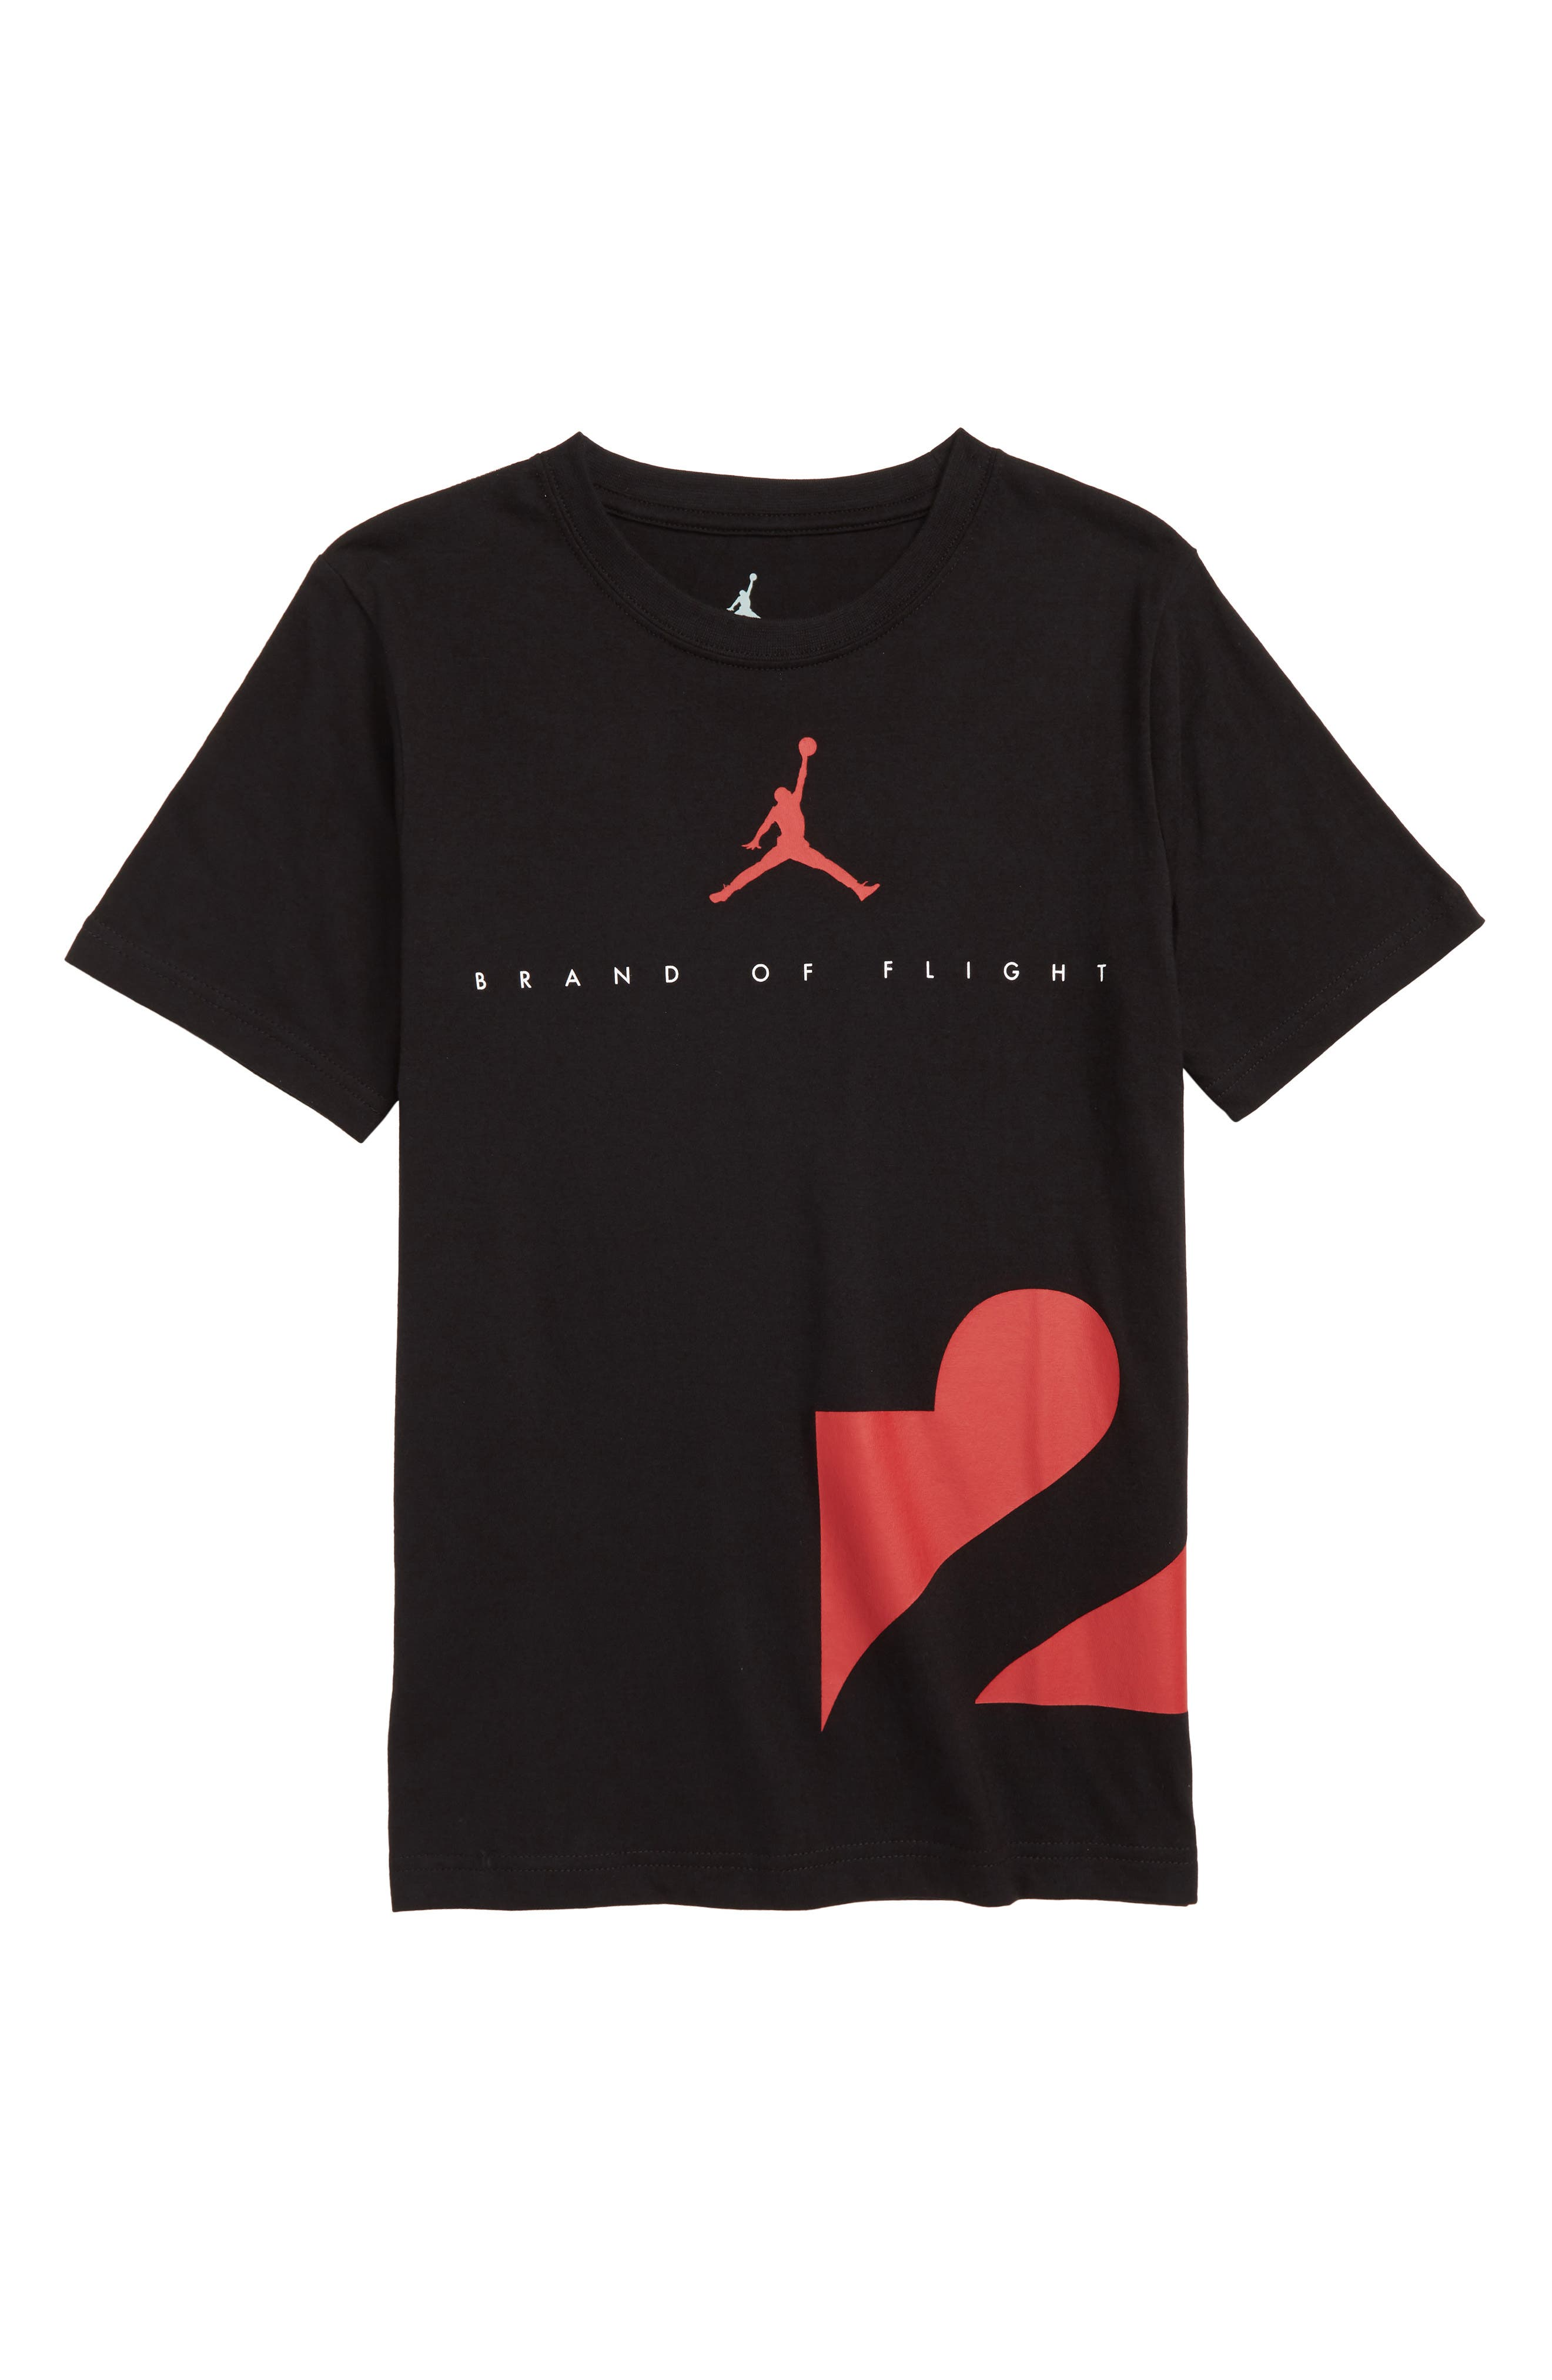 Jordan Two Three T-Shirt,                         Main,                         color, BLACK